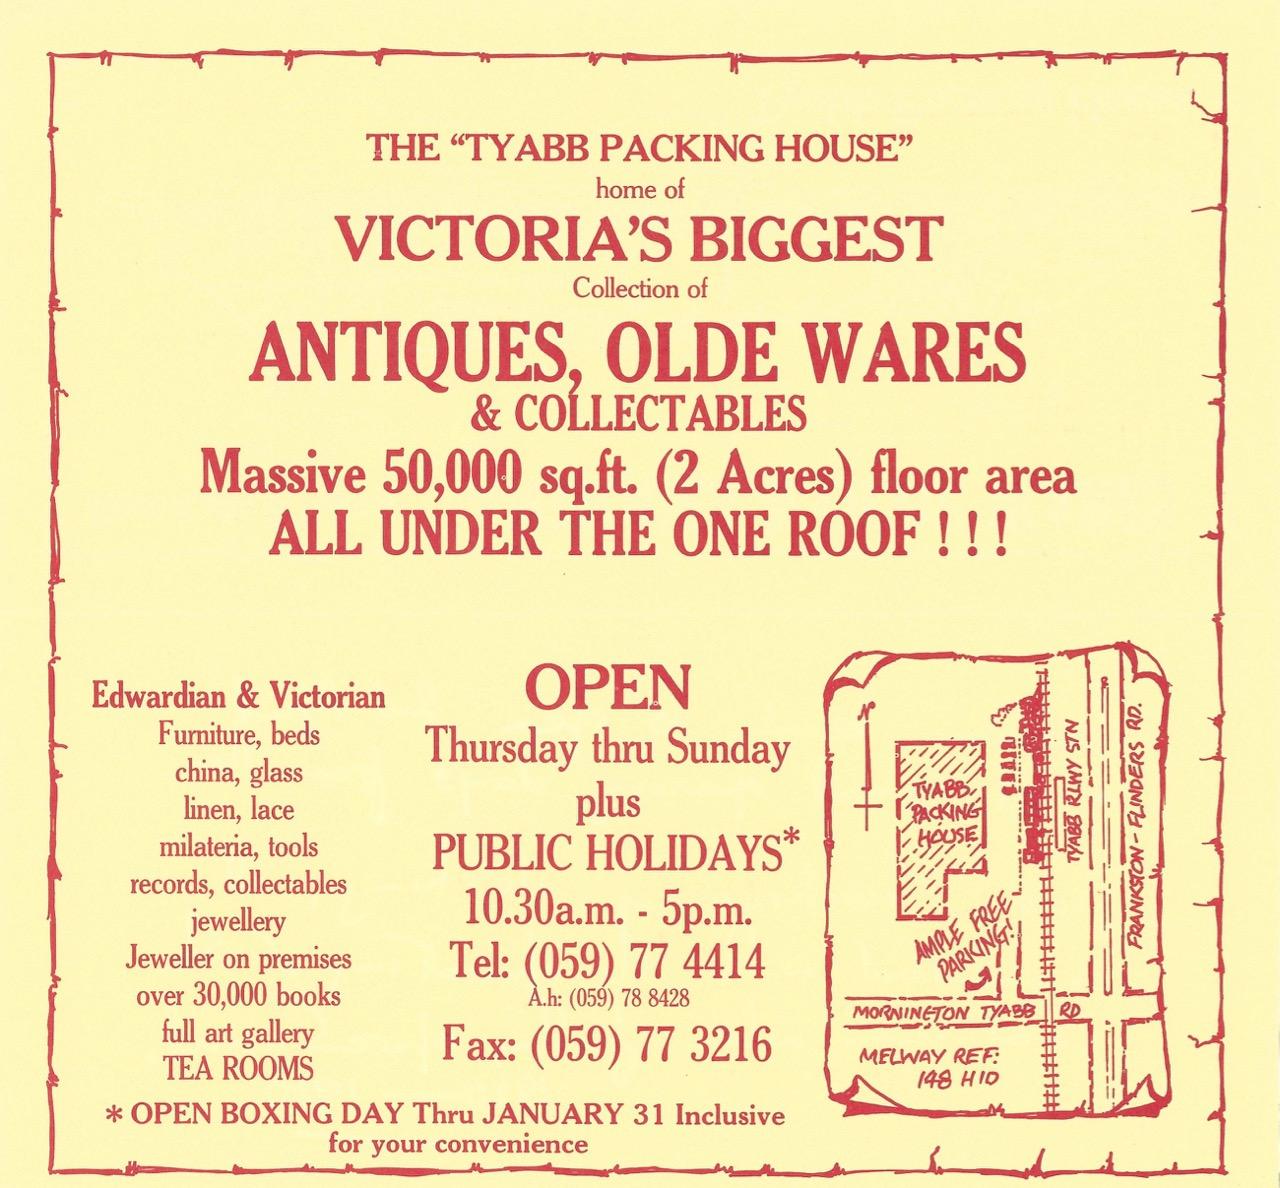 1994 interior card